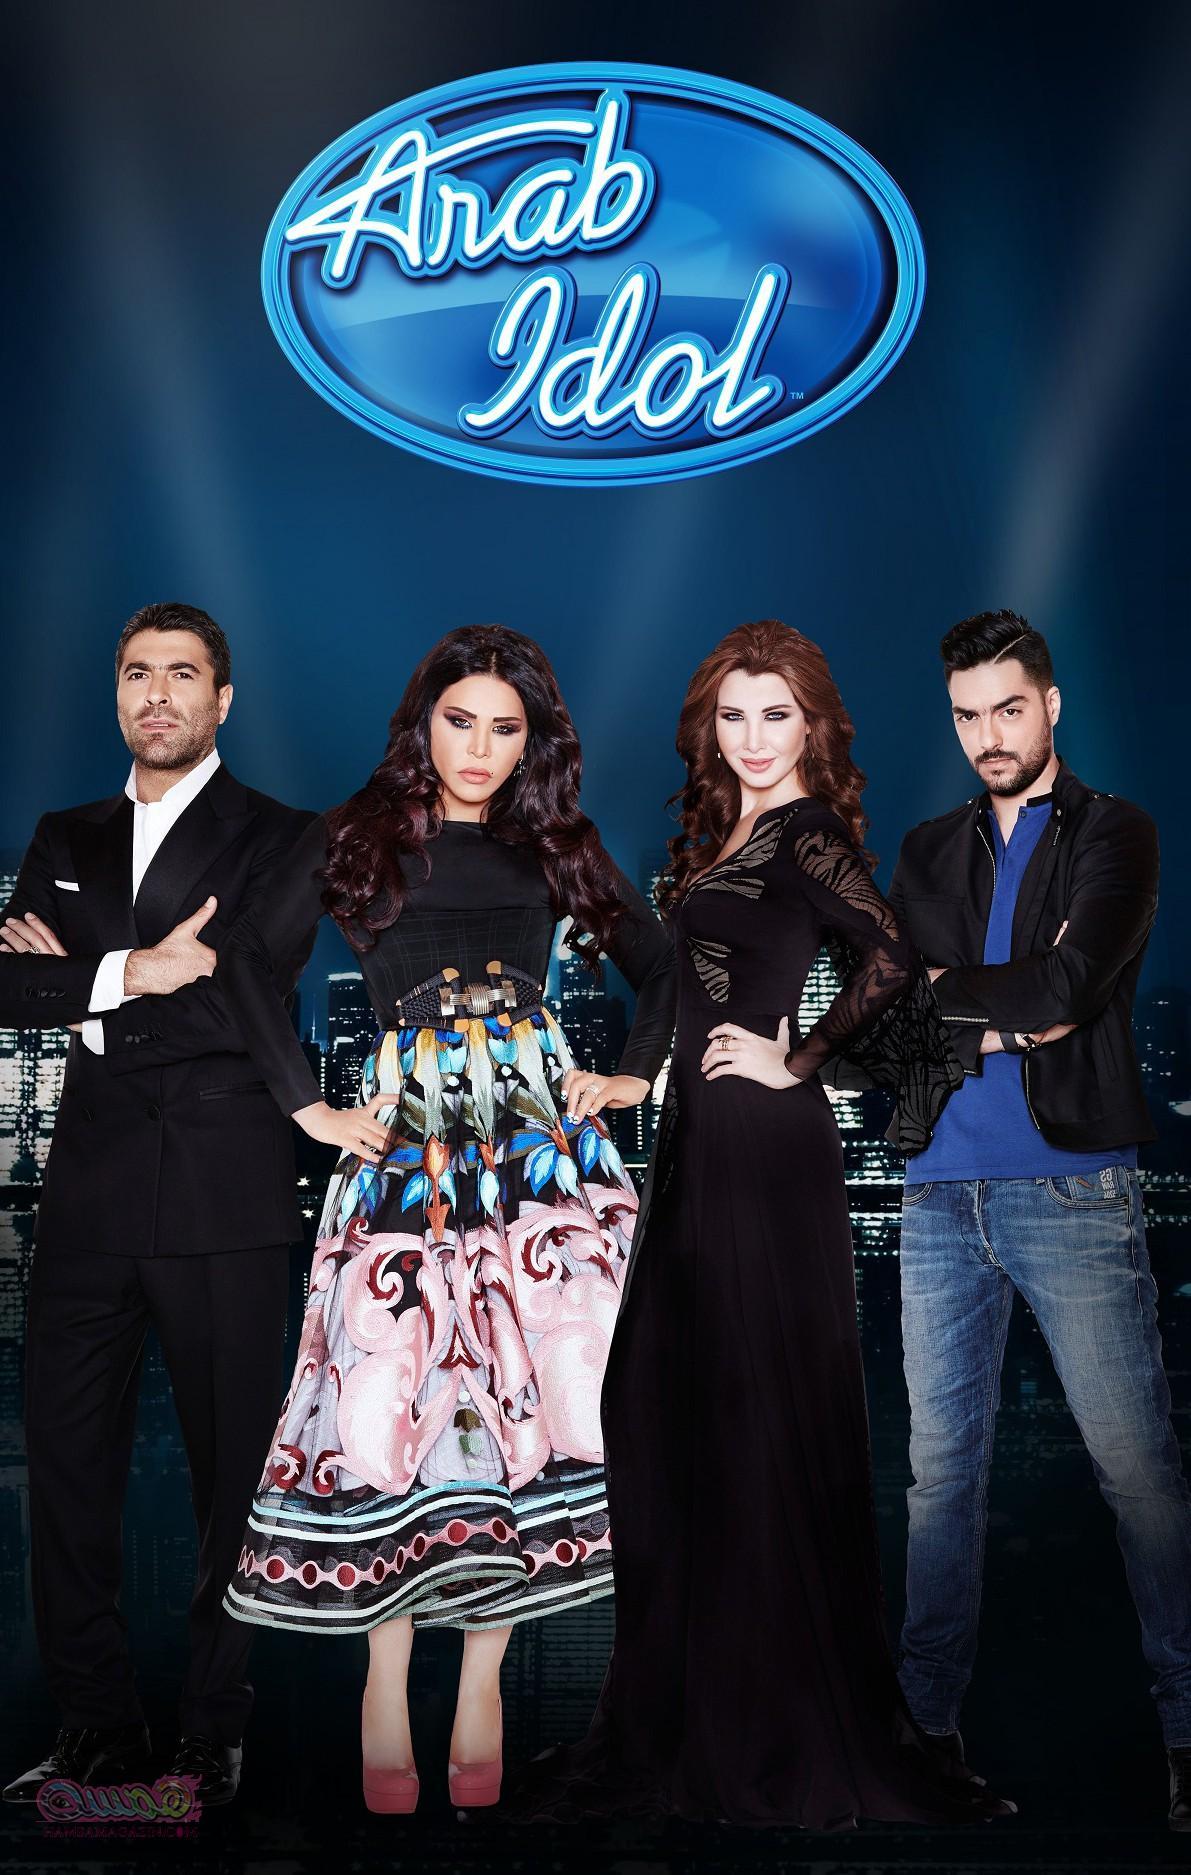 arab-idol-s3-jury-members-hassan-al-shafei-ahlam-nancy-ajram-wael-kfoury-1-e1413706742940